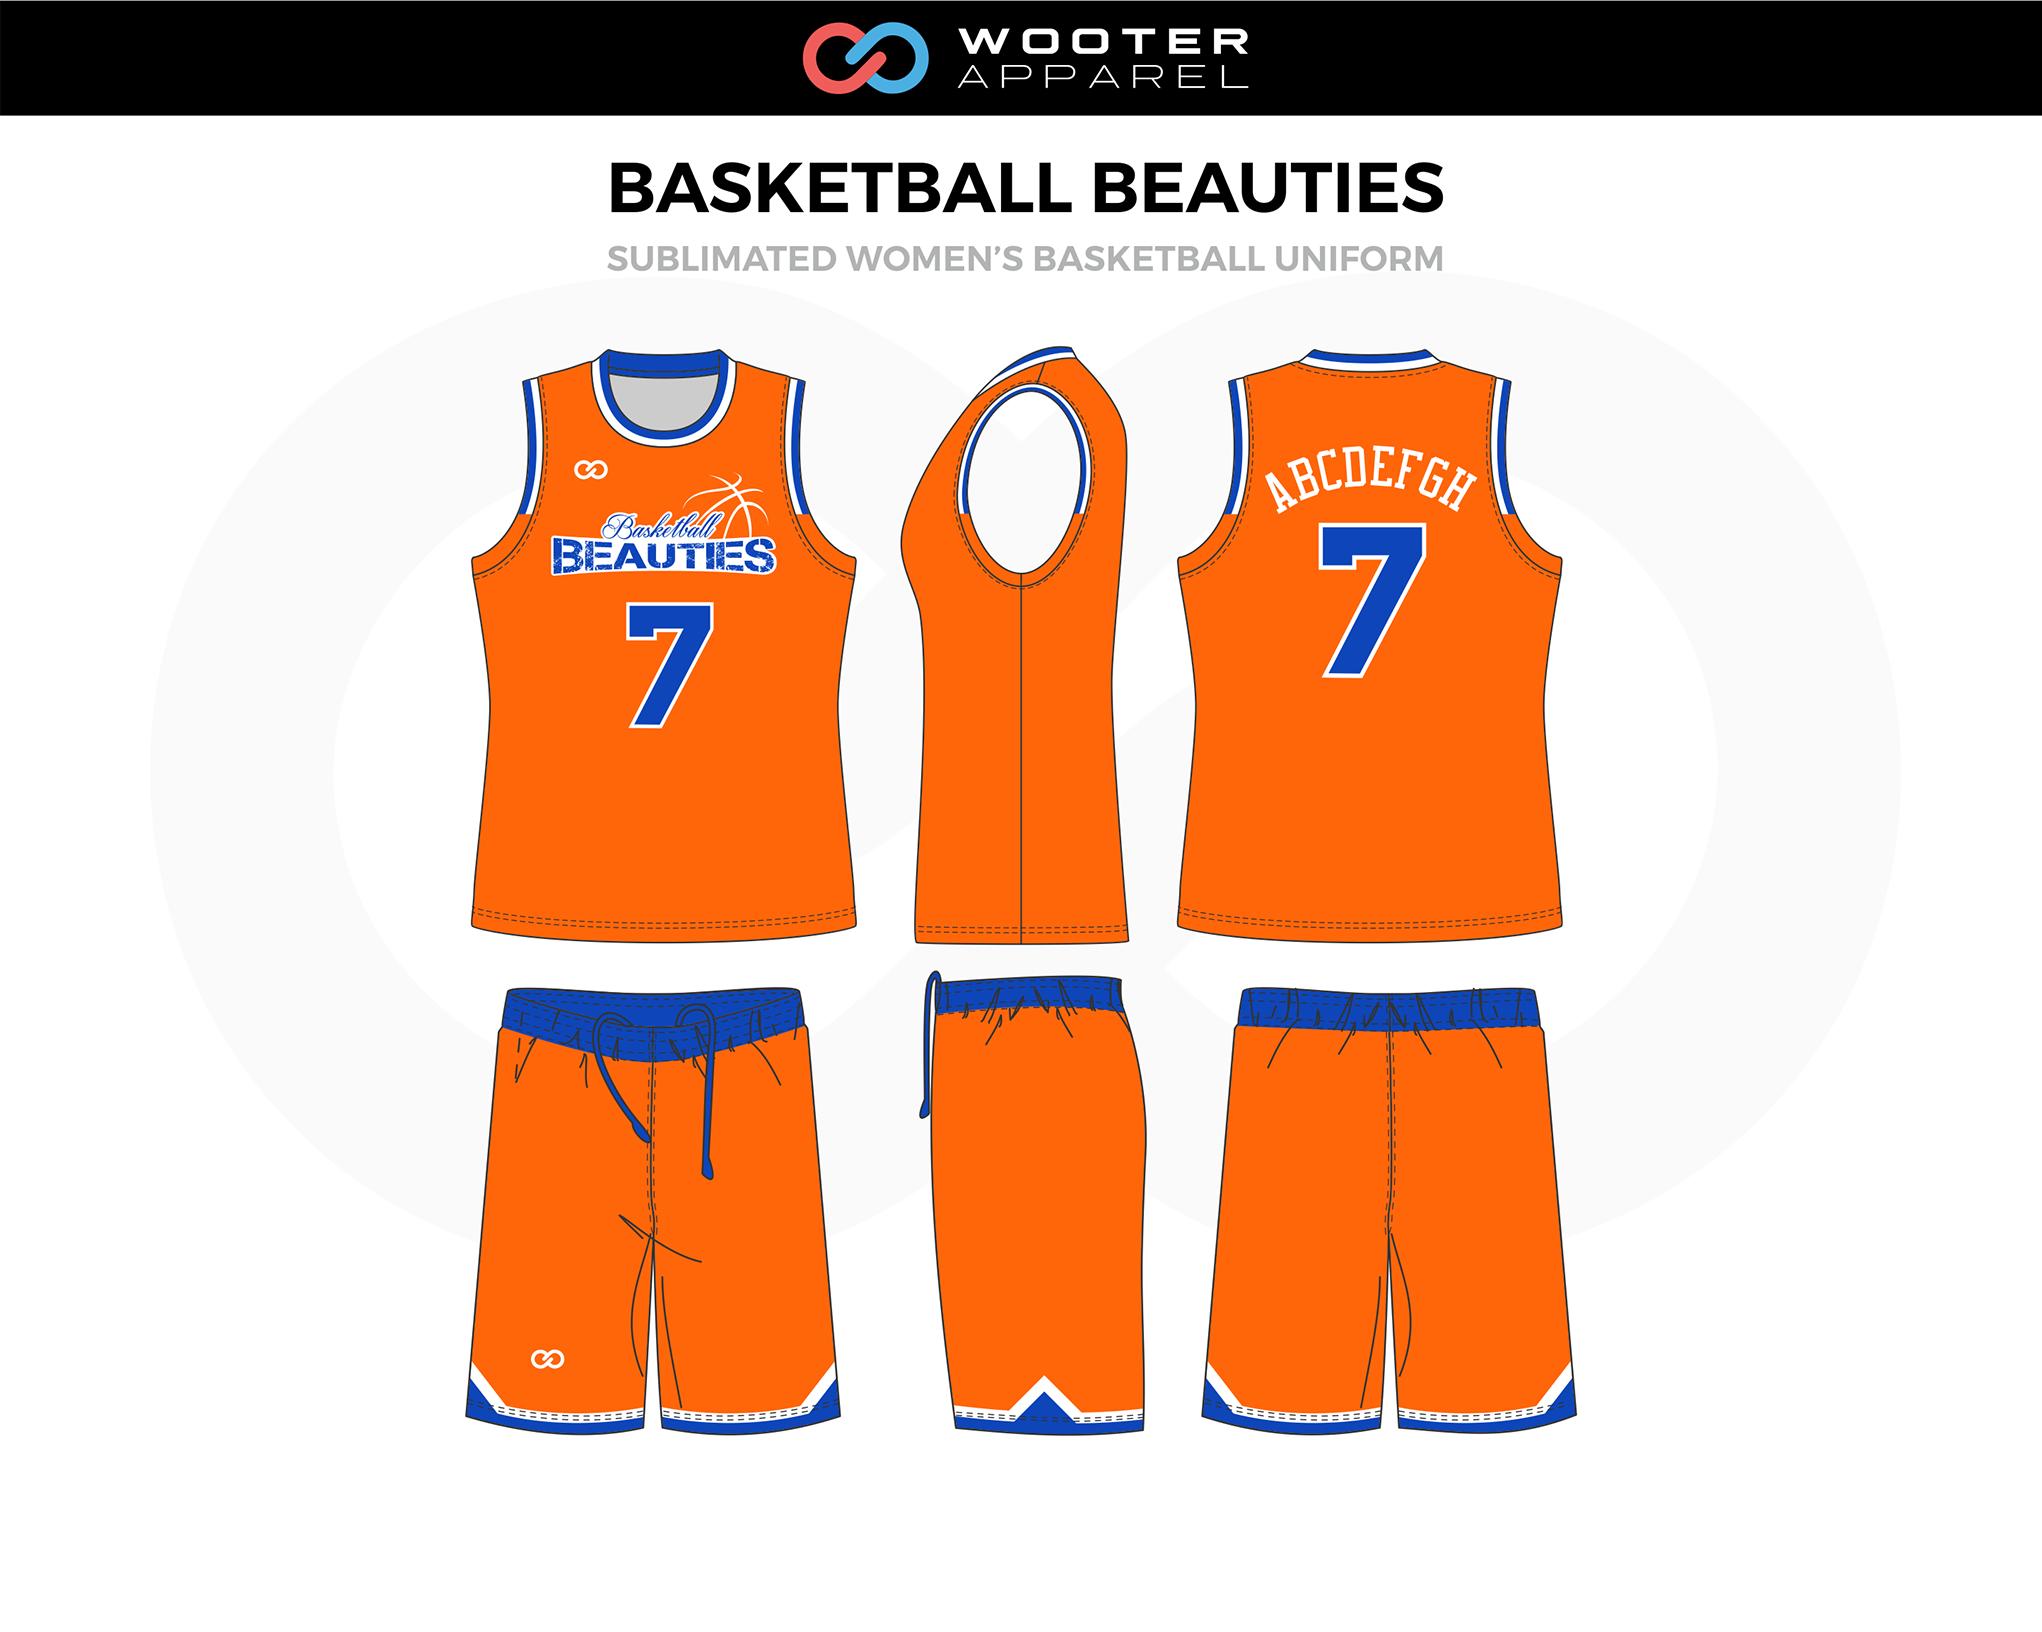 the latest dc97d 64bbd Basketball Uniform Designs — Wooter Apparel | Team Uniforms ...